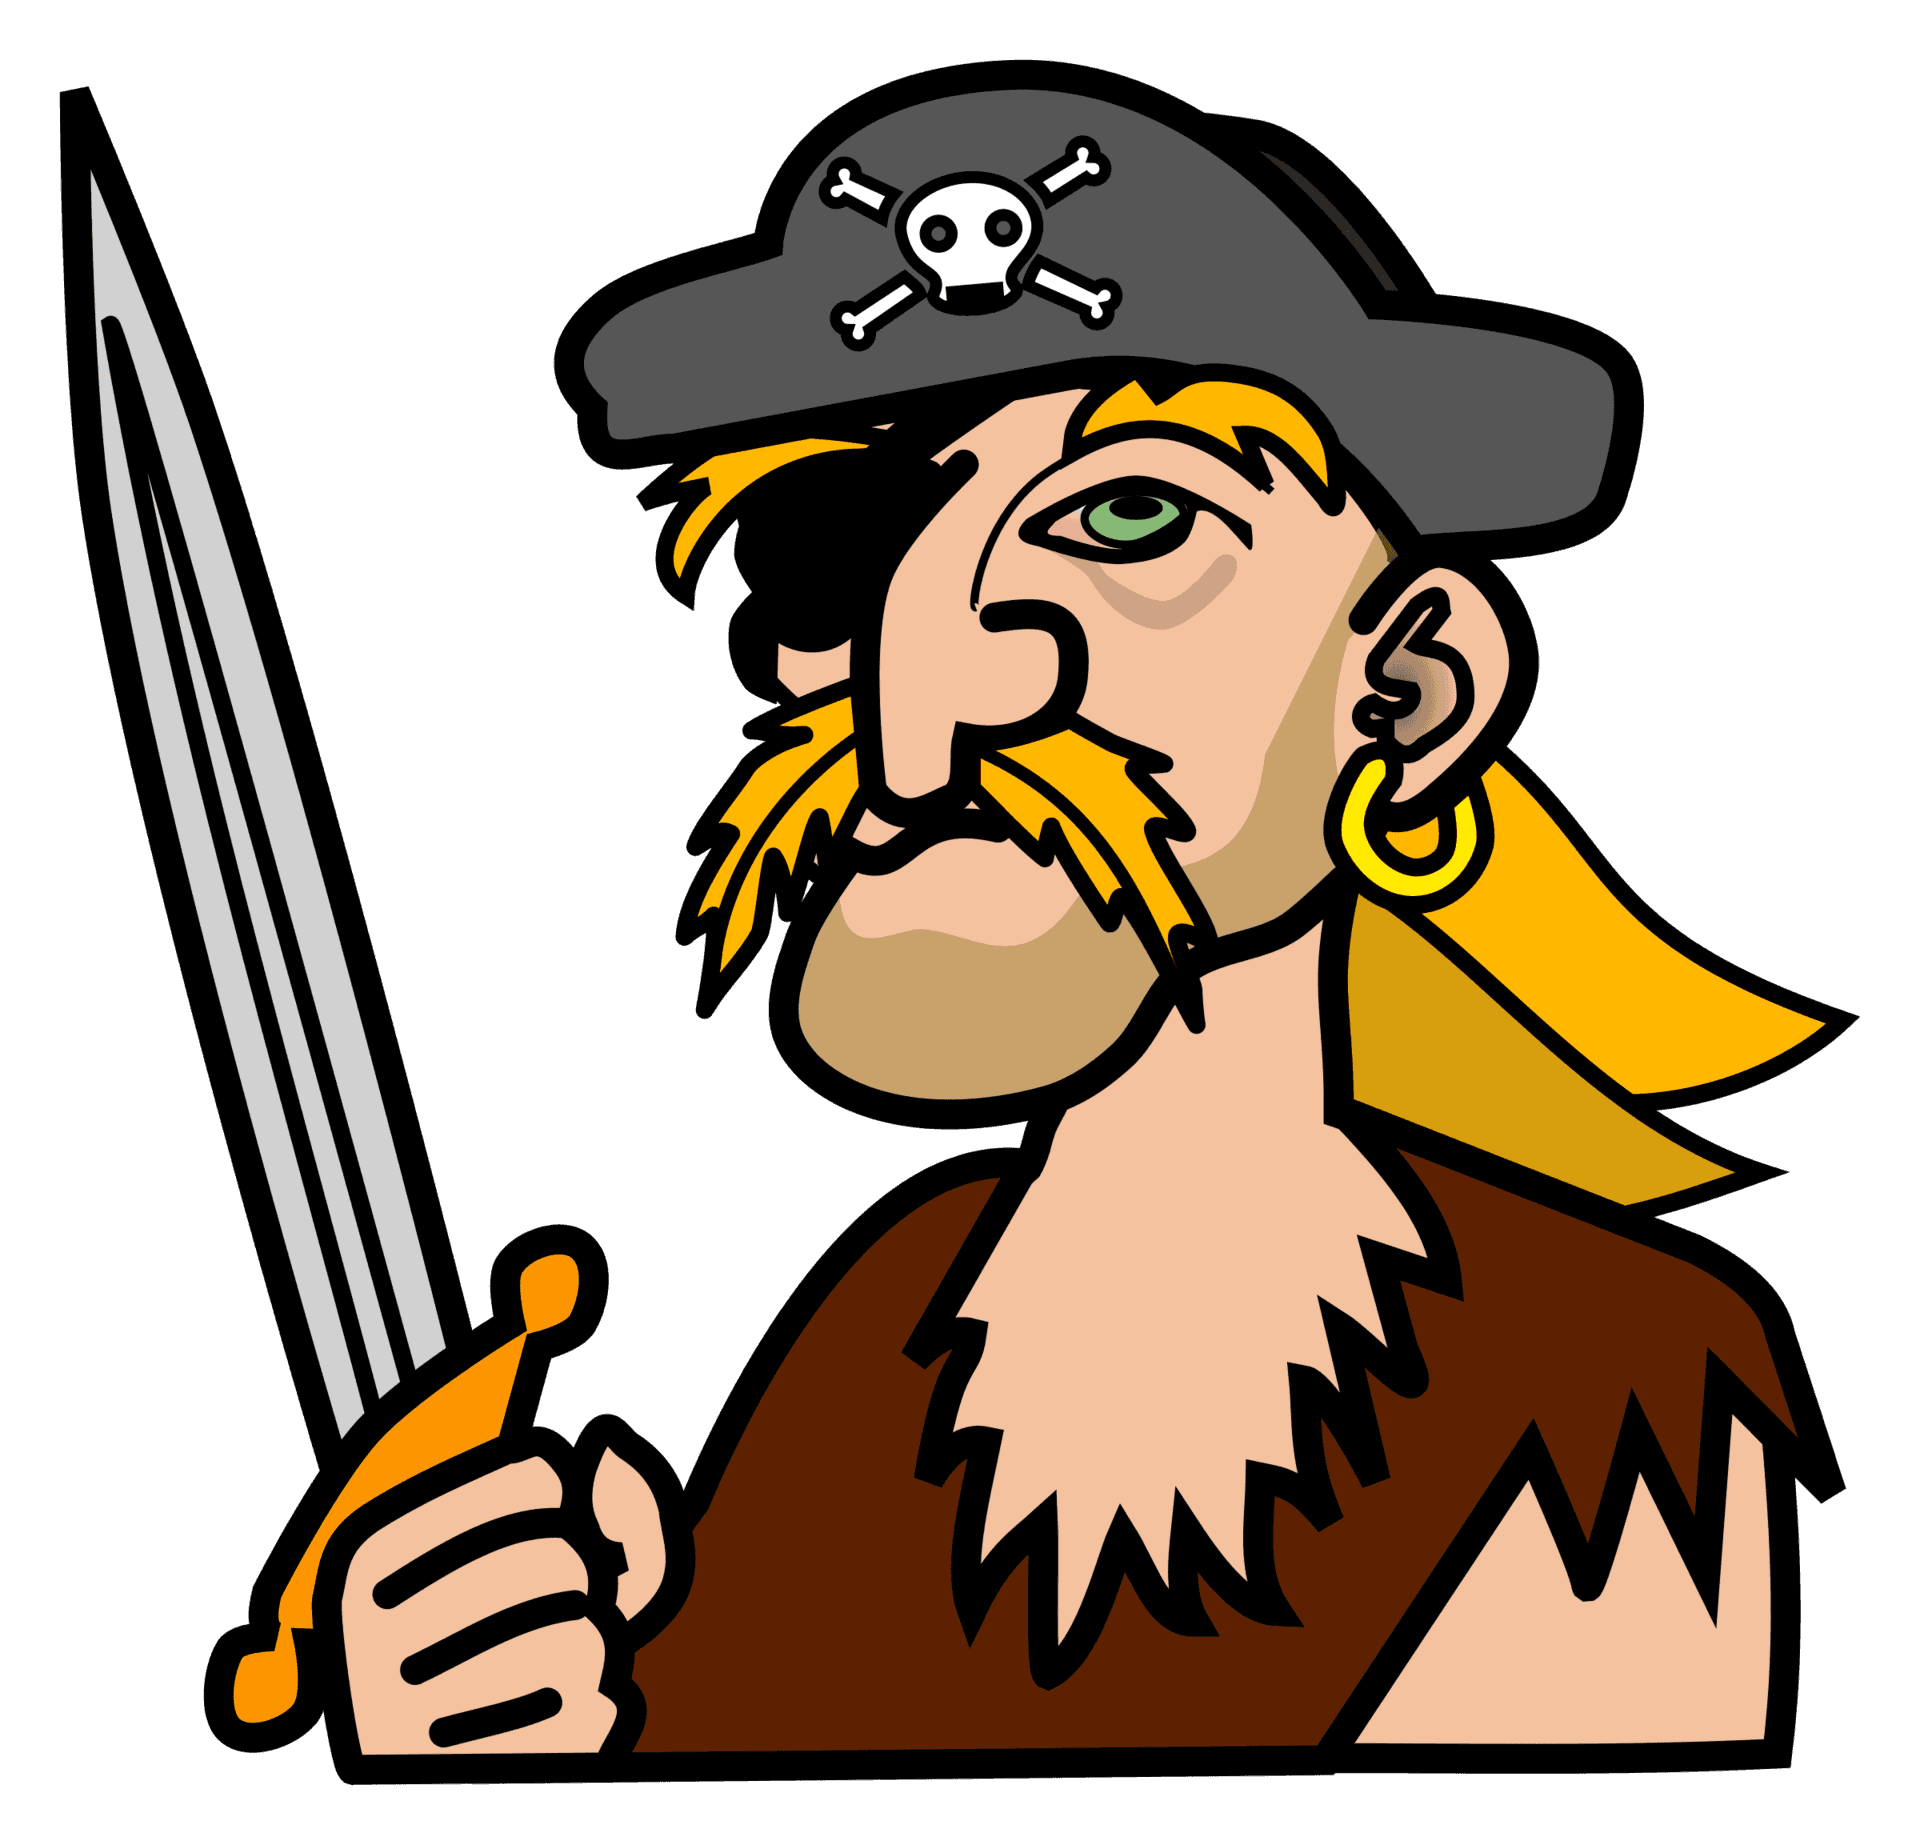 Pirate Spyglass